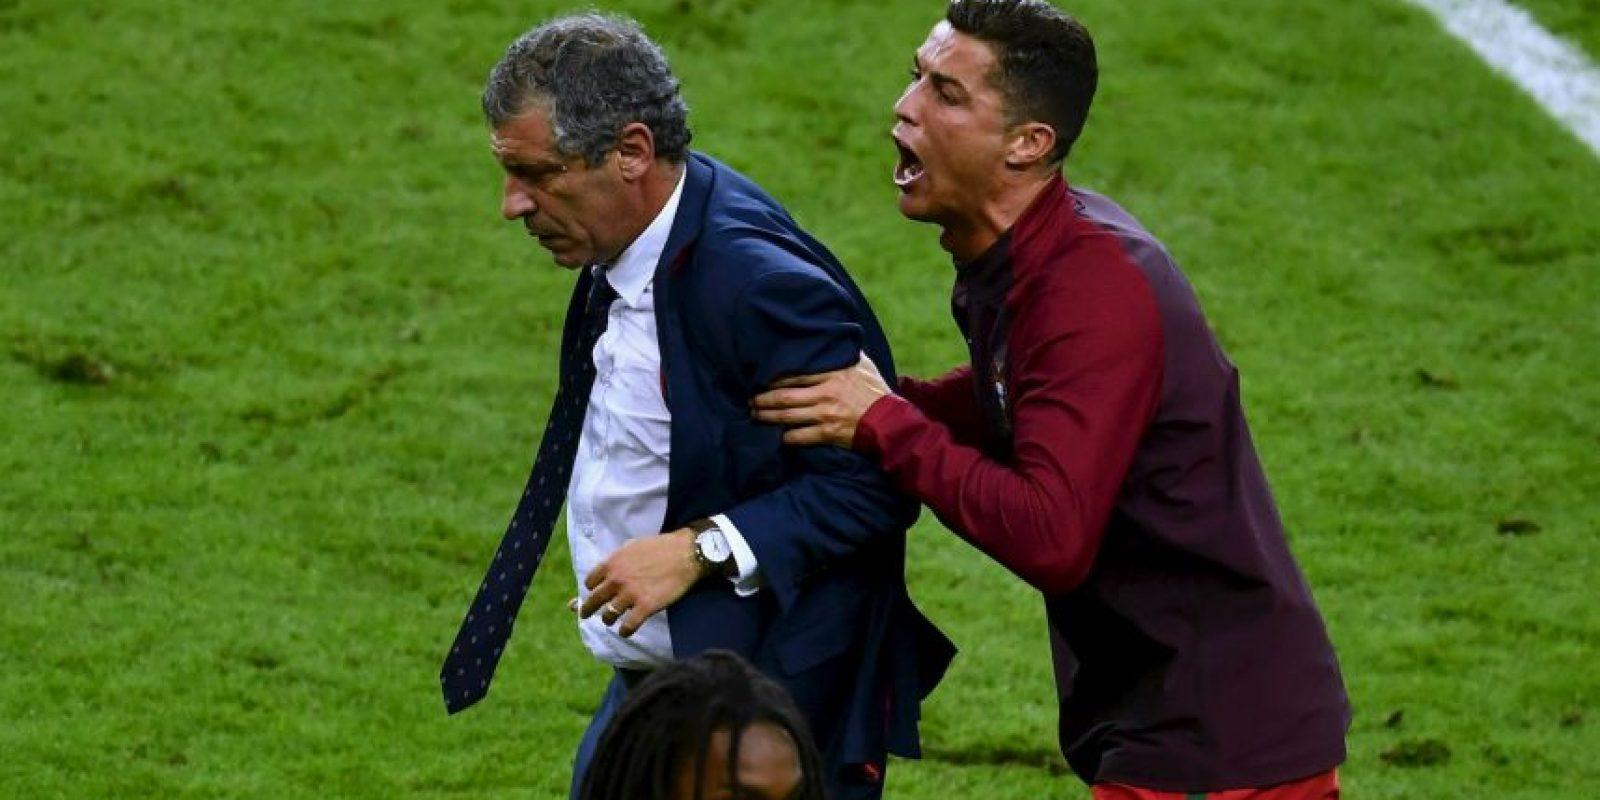 Así vivió Cristiano Ronaldo la final de la Euro 2016 Foto:Getty Images